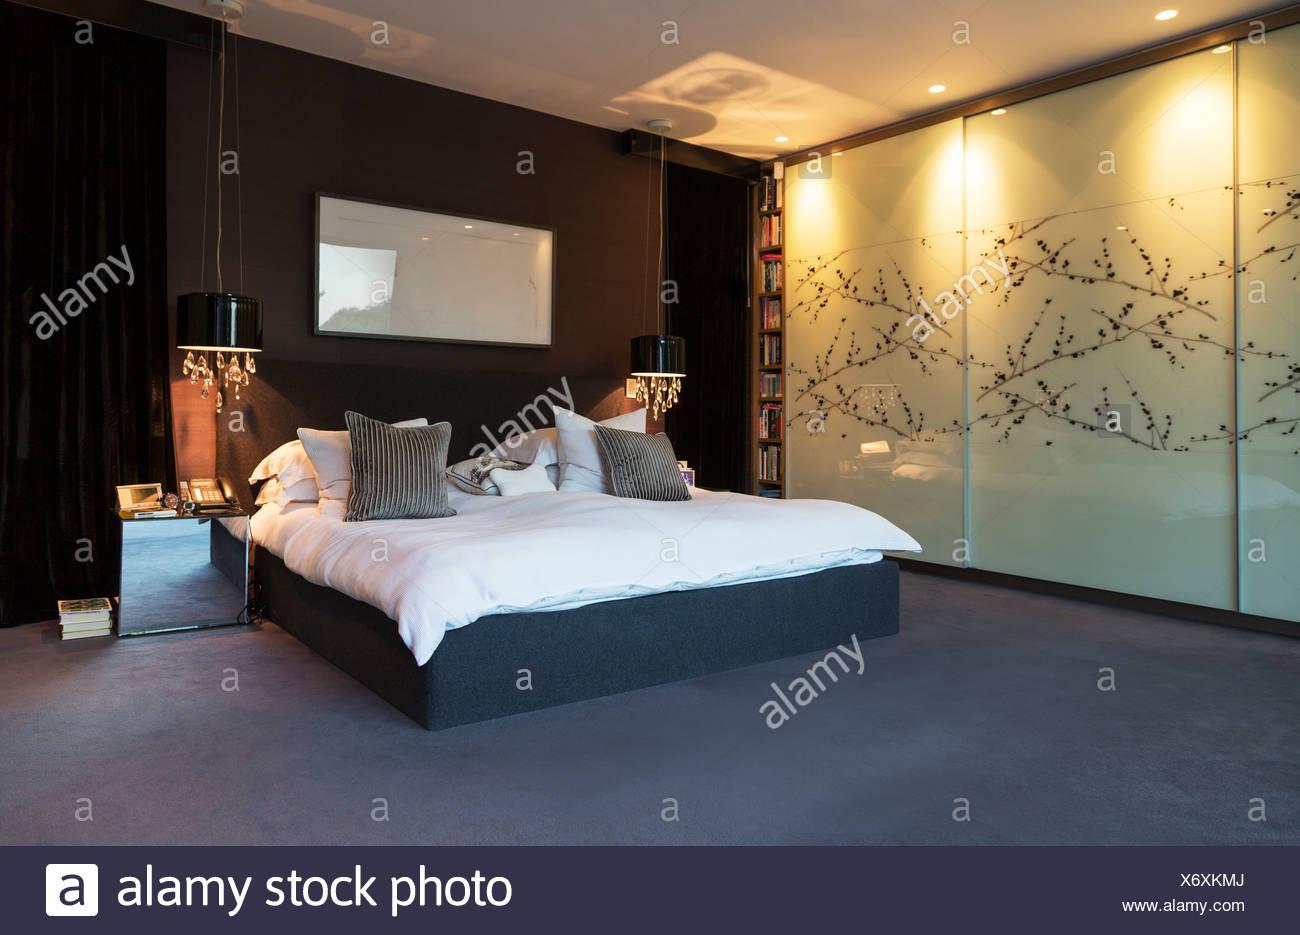 Wall art in modern bedroom - Stock Image